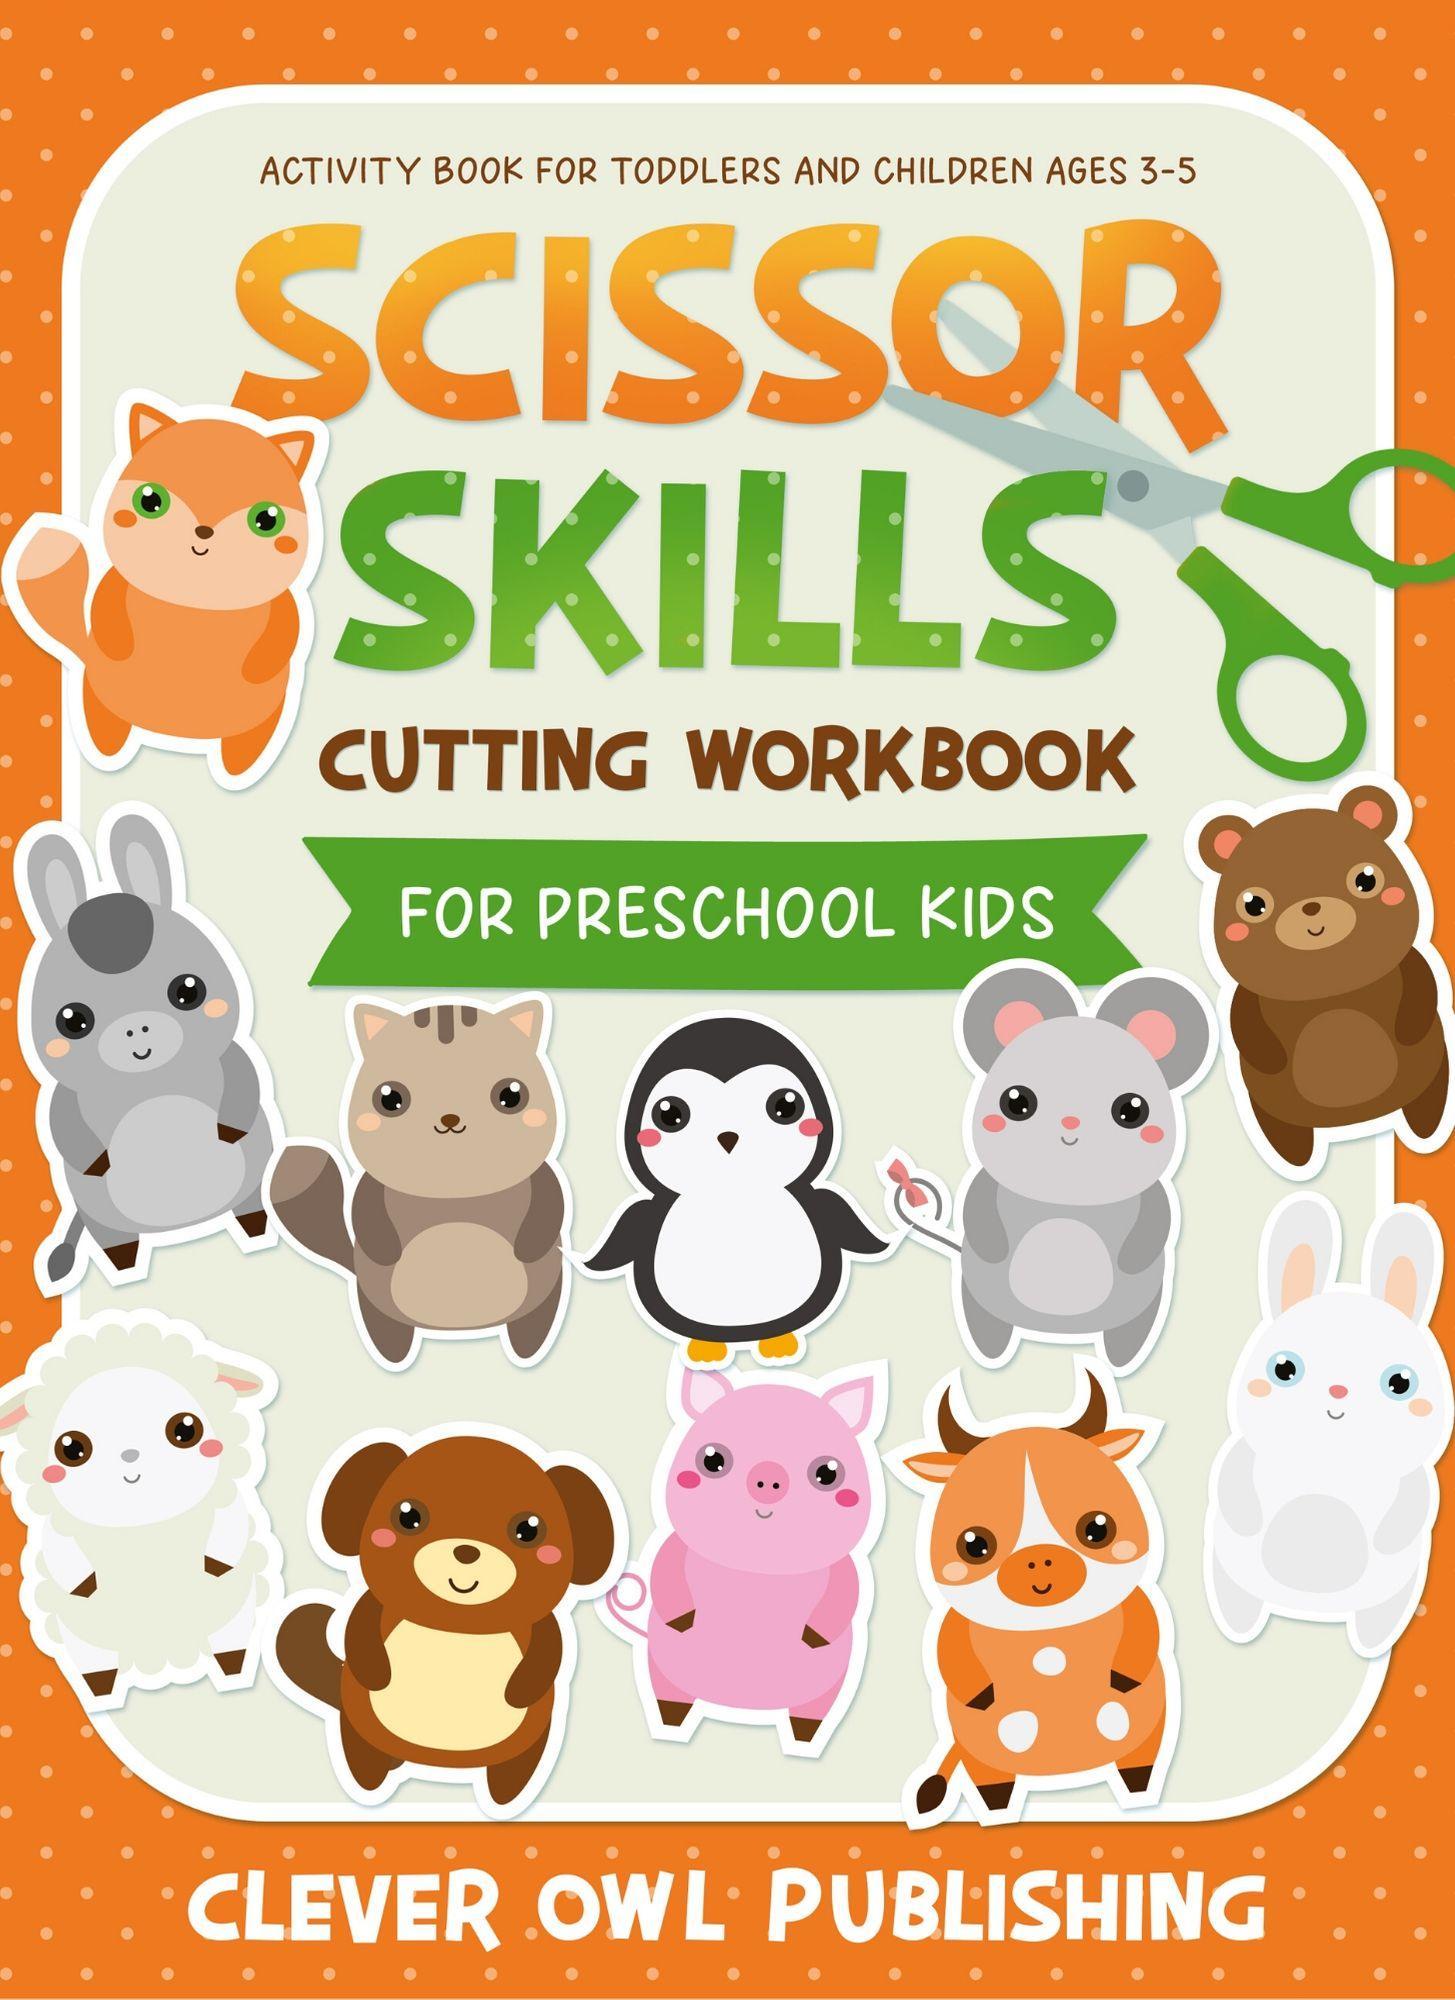 Get Your Free Copy Of Scissor Skills Cutting Workbook For